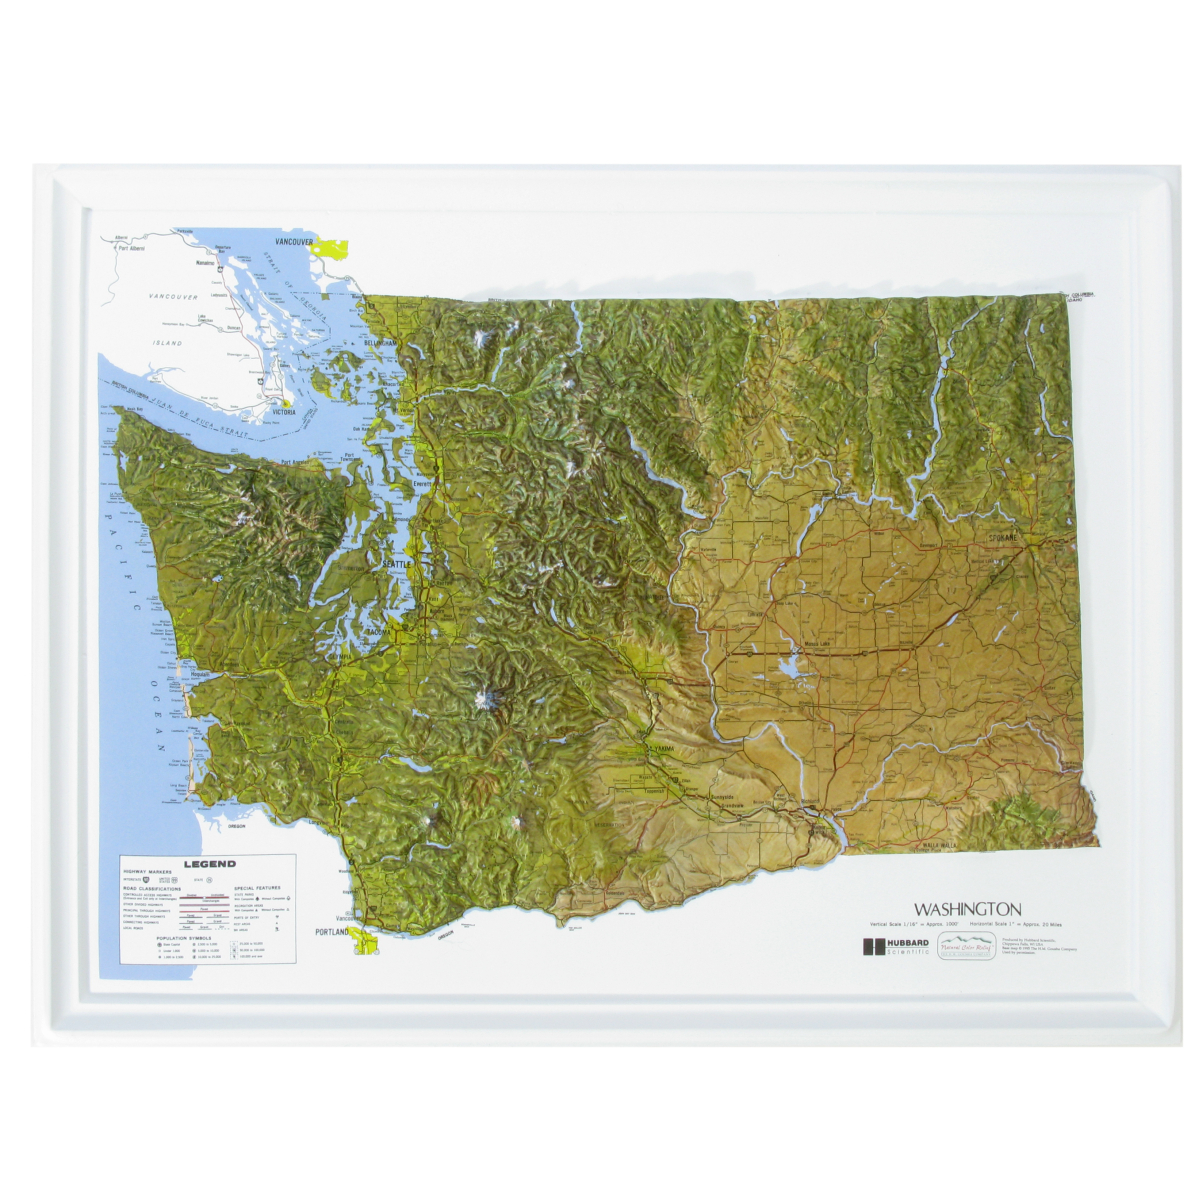 American Education Raised Relief Map Washington Ncr